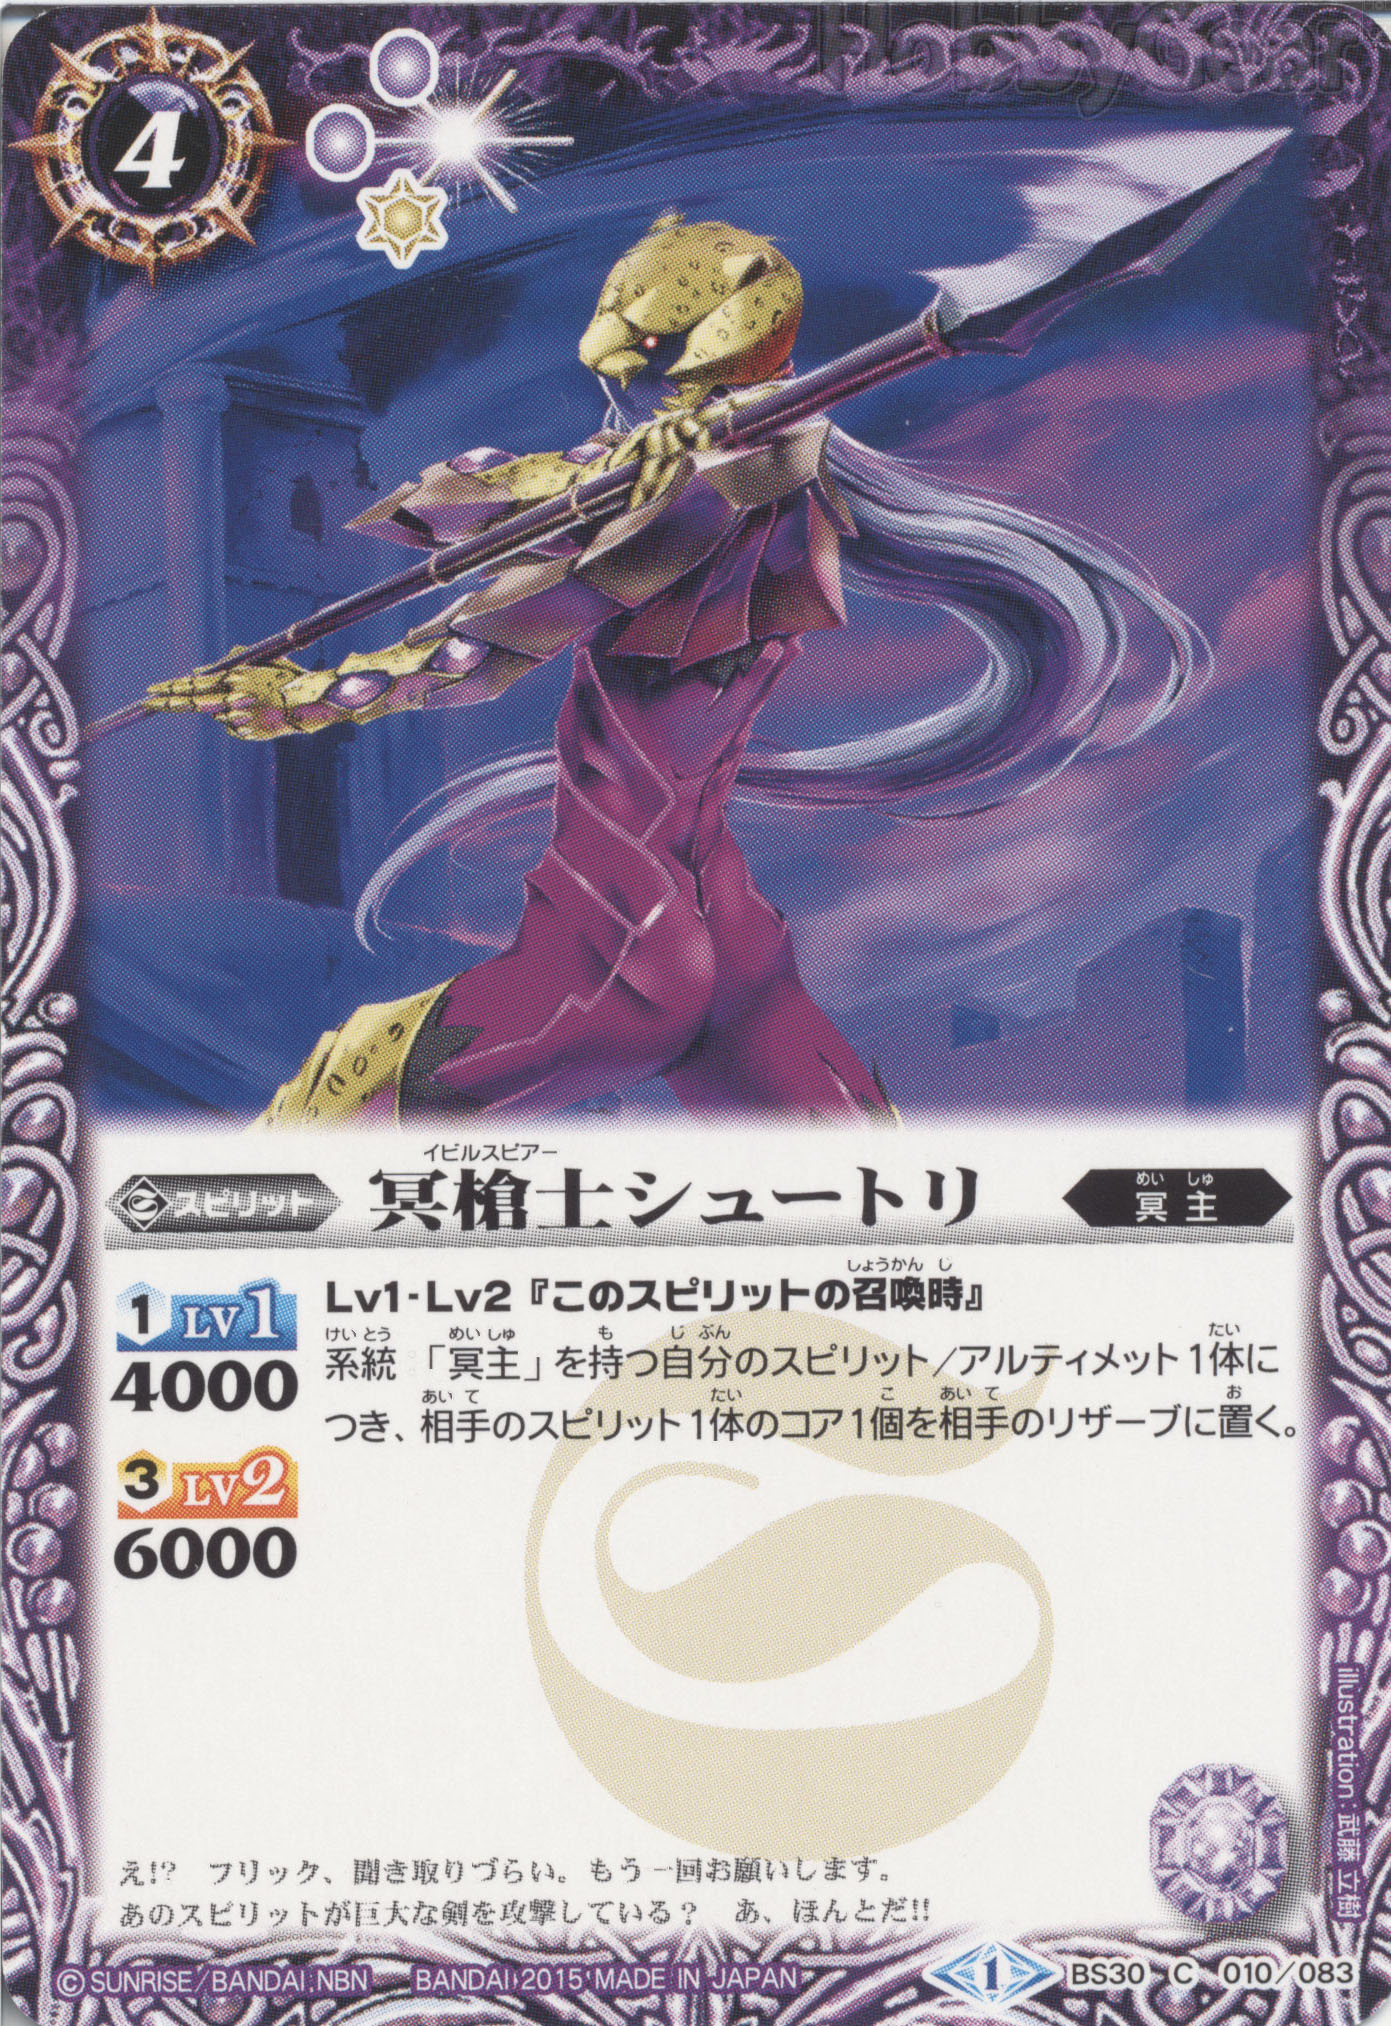 The EvilSpear Shutori